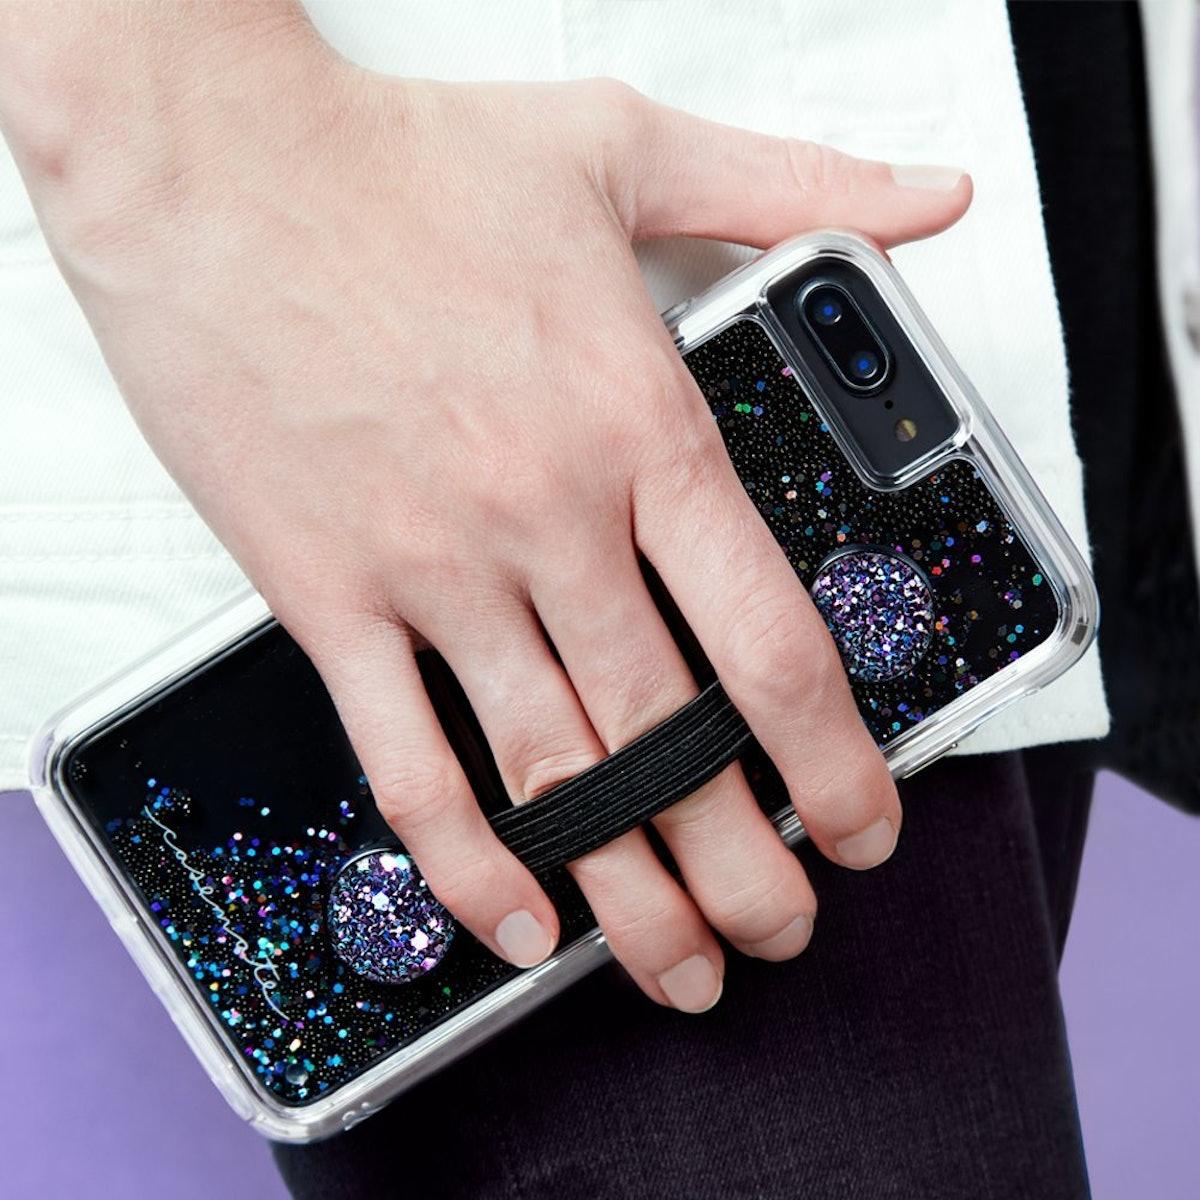 Case-Mate - STRAPS - Sparkly - Phone Grip